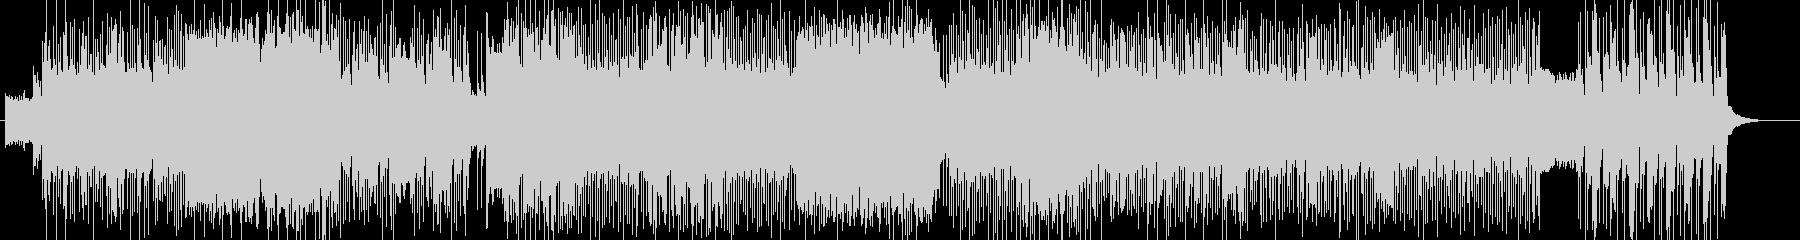 「HR/HM」「DARK/ROCK」の未再生の波形